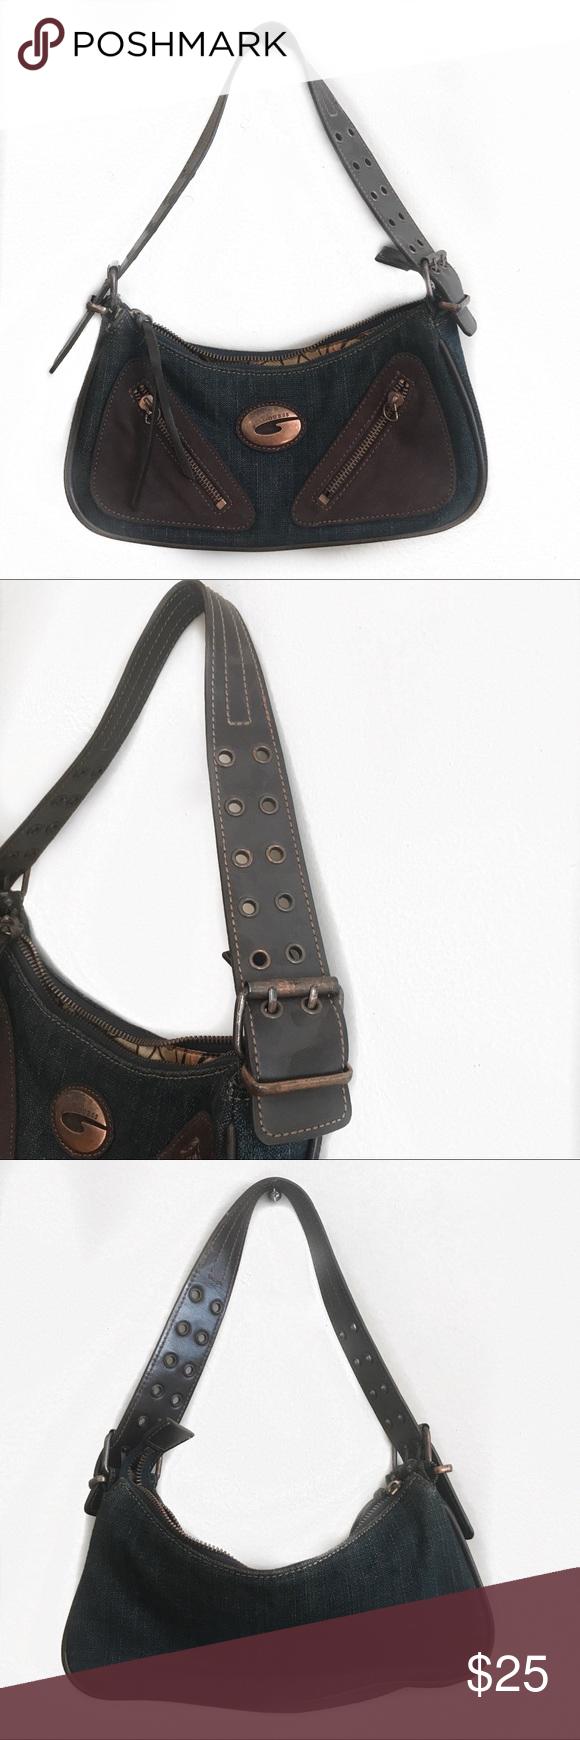 VINTAGE GUESS JEAN HANDBAG Vintage Guess Jean Denim Shoulder bag. ⭐️PLEASE  NOTE ZIPPER IS 65c630ca60